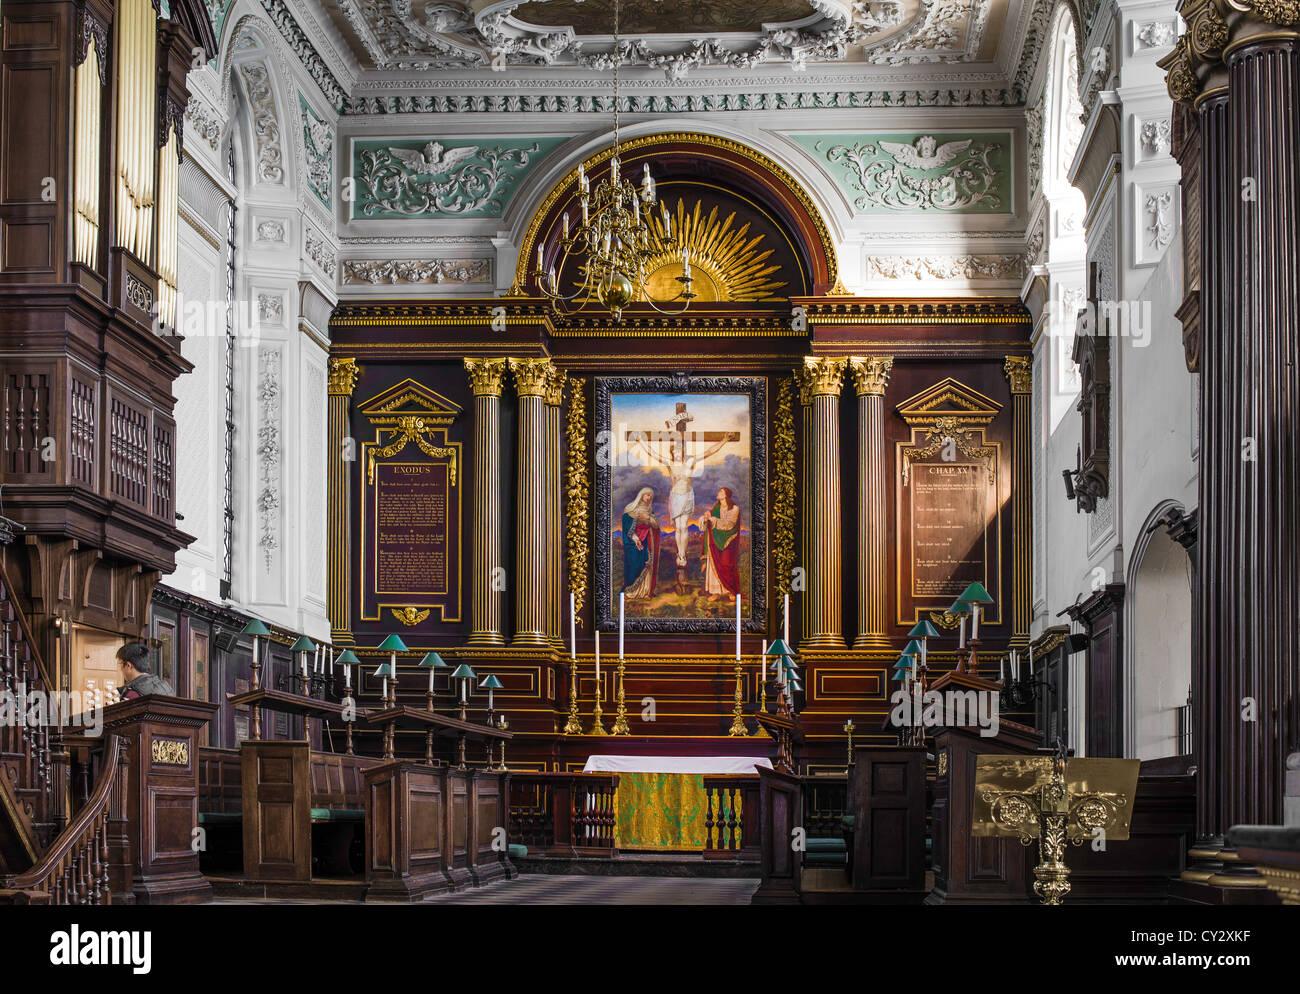 Chancel of All Saints church, Northampton - Stock Image